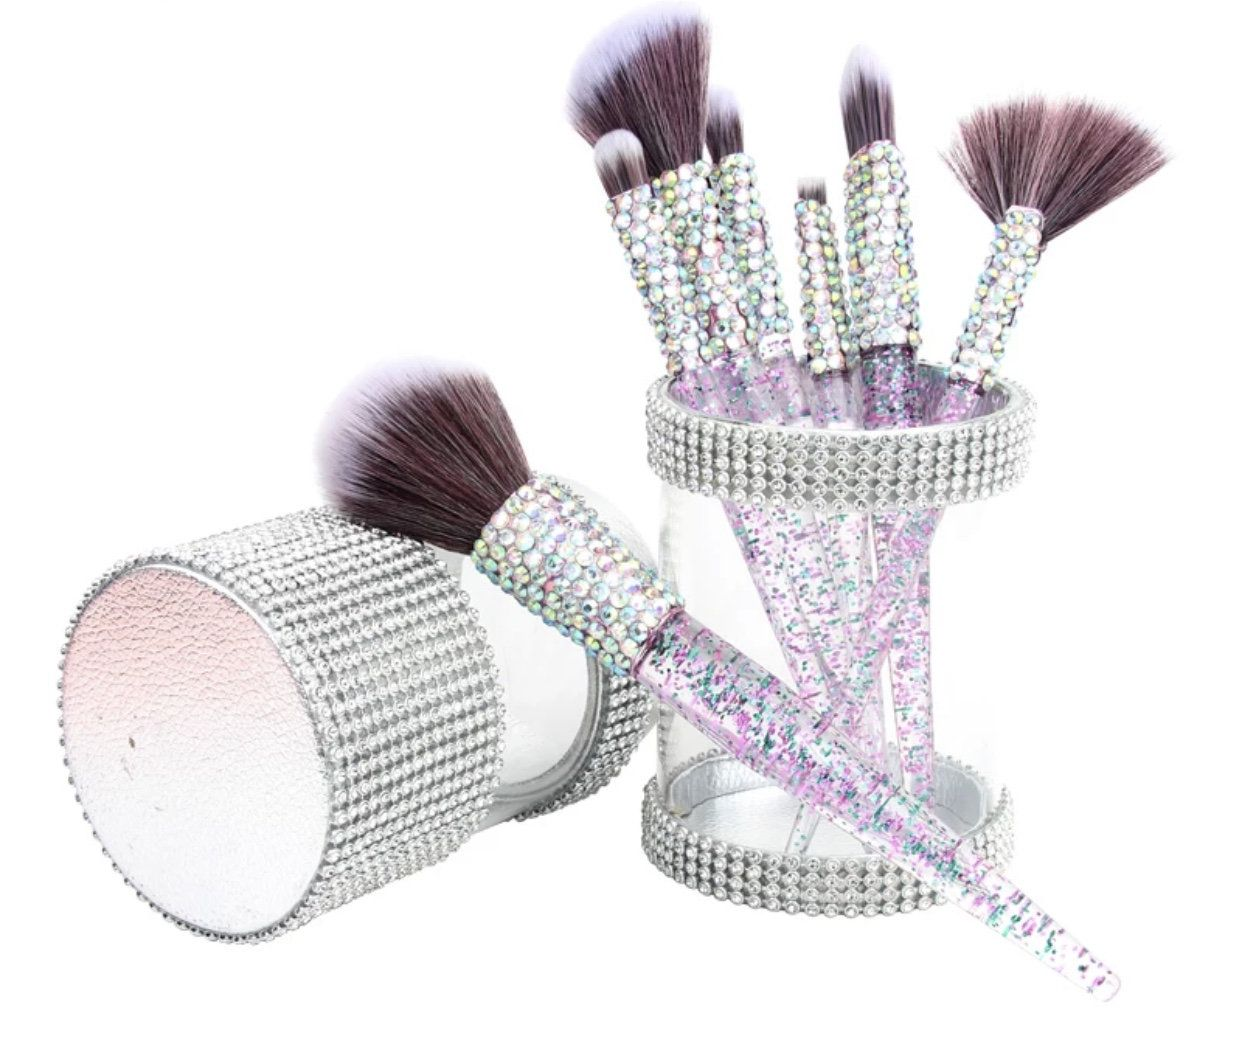 Crystal Diamond Makeup Brush Set!! #CrystalBrushes #MakeupBrushes #Sincerelyadorecosmetics #Cosmetics #Purplemakeupbrushes